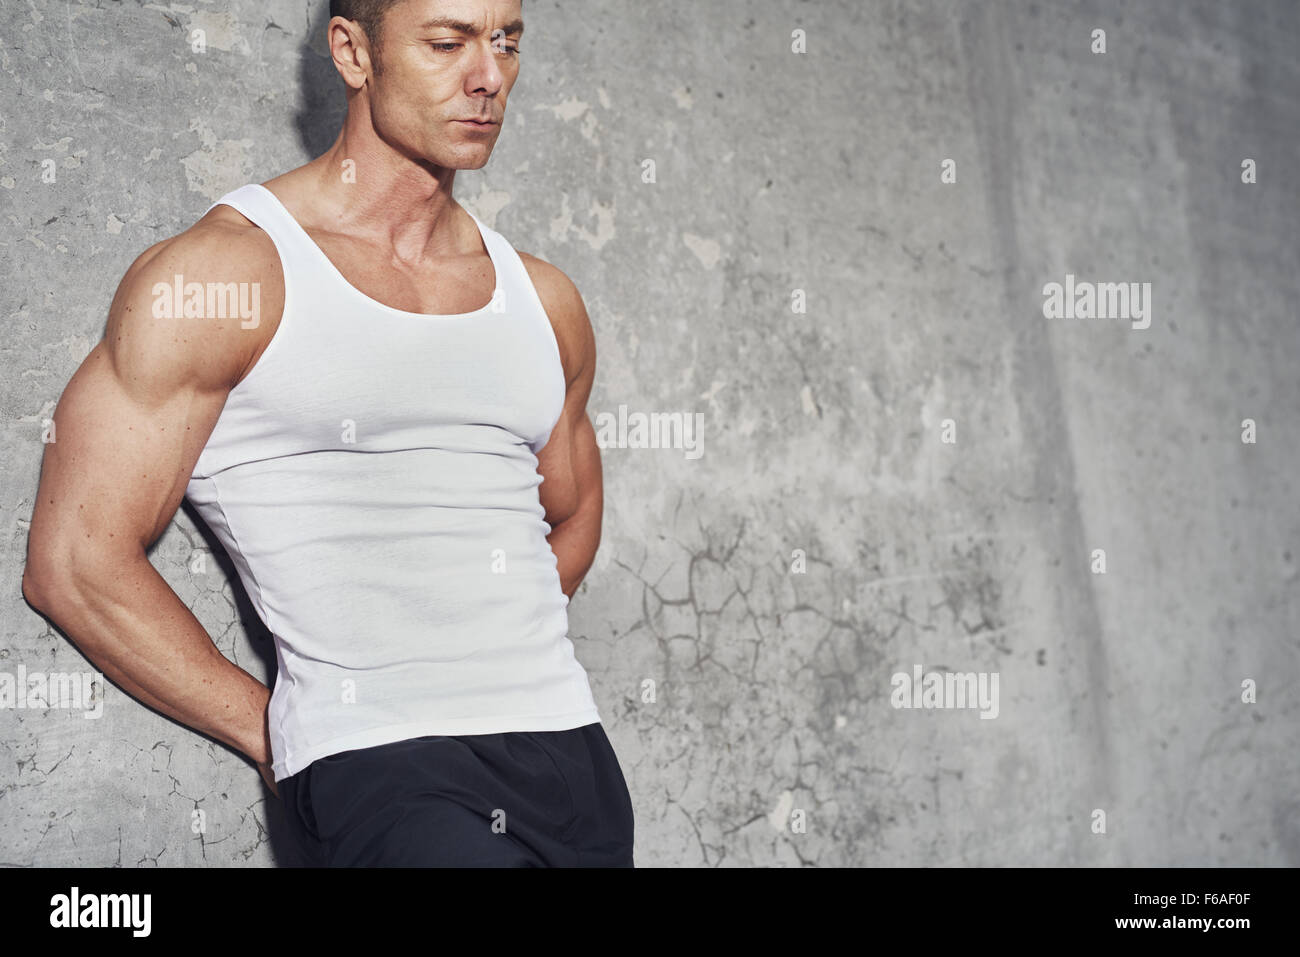 Close up fitness concept portrait of white man, fit and healthy, white tanktop, fitness concept - Stock Image